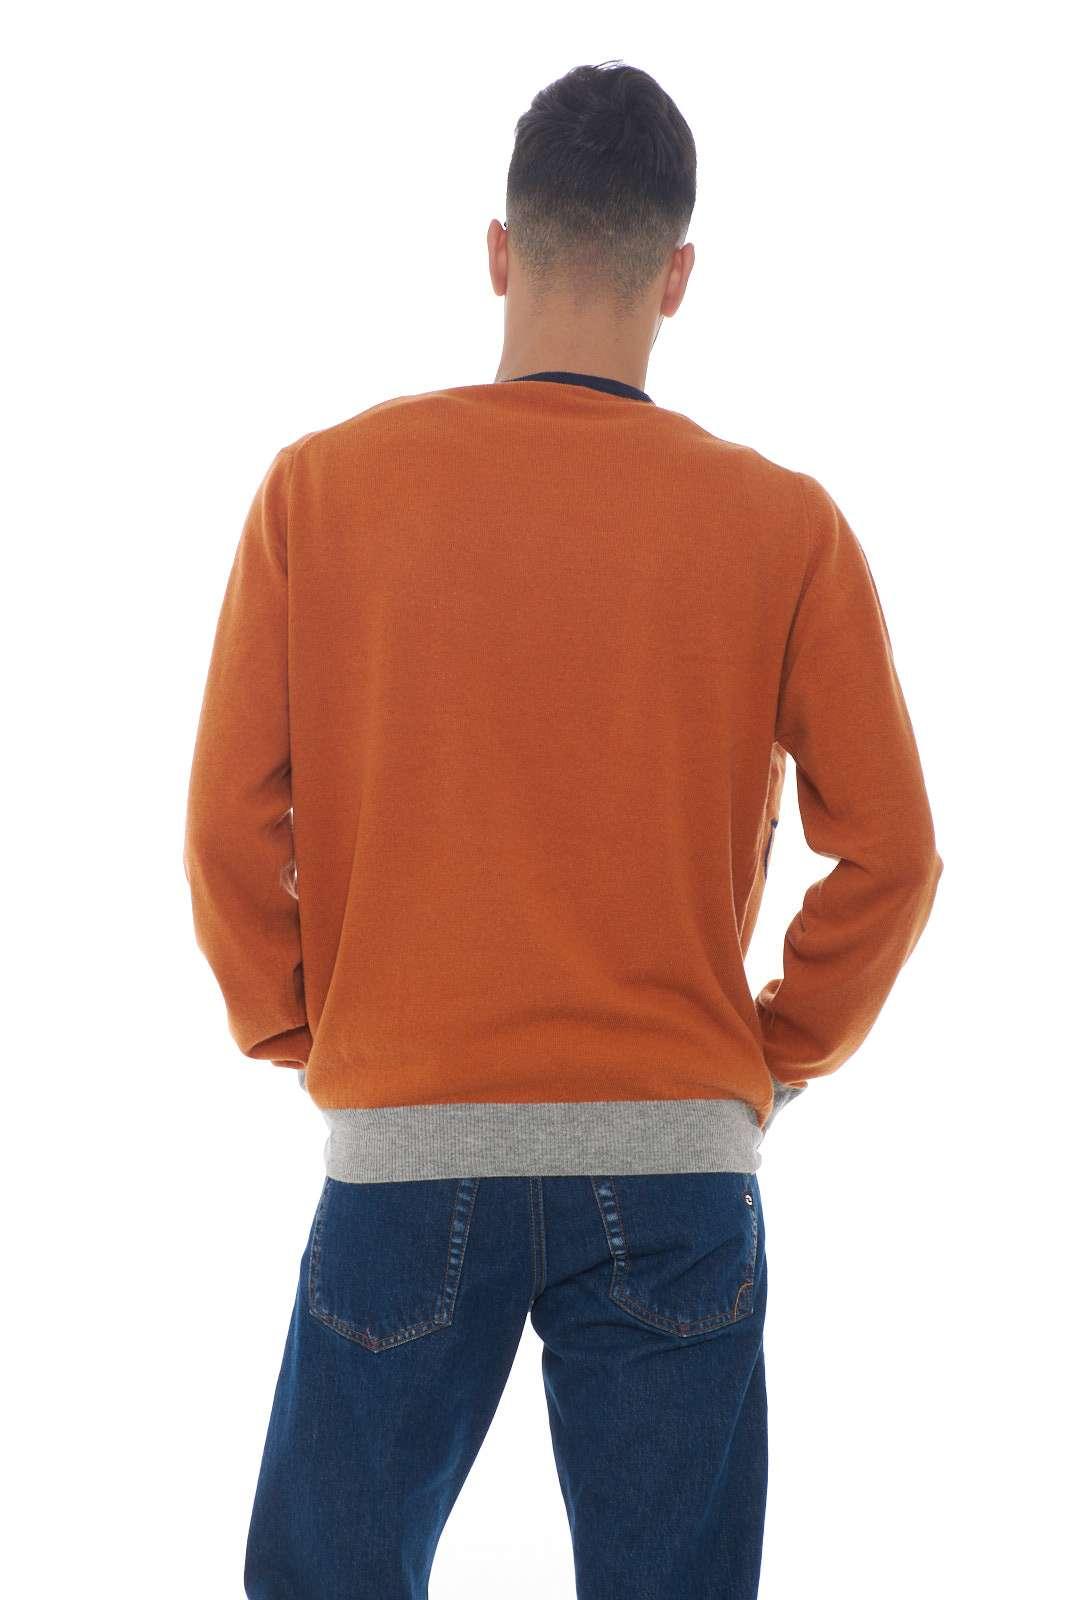 https://www.parmax.com/media/catalog/product/a/i/AI-outlet_parmax-maglia-uomo-Acquapura-008-C.jpg